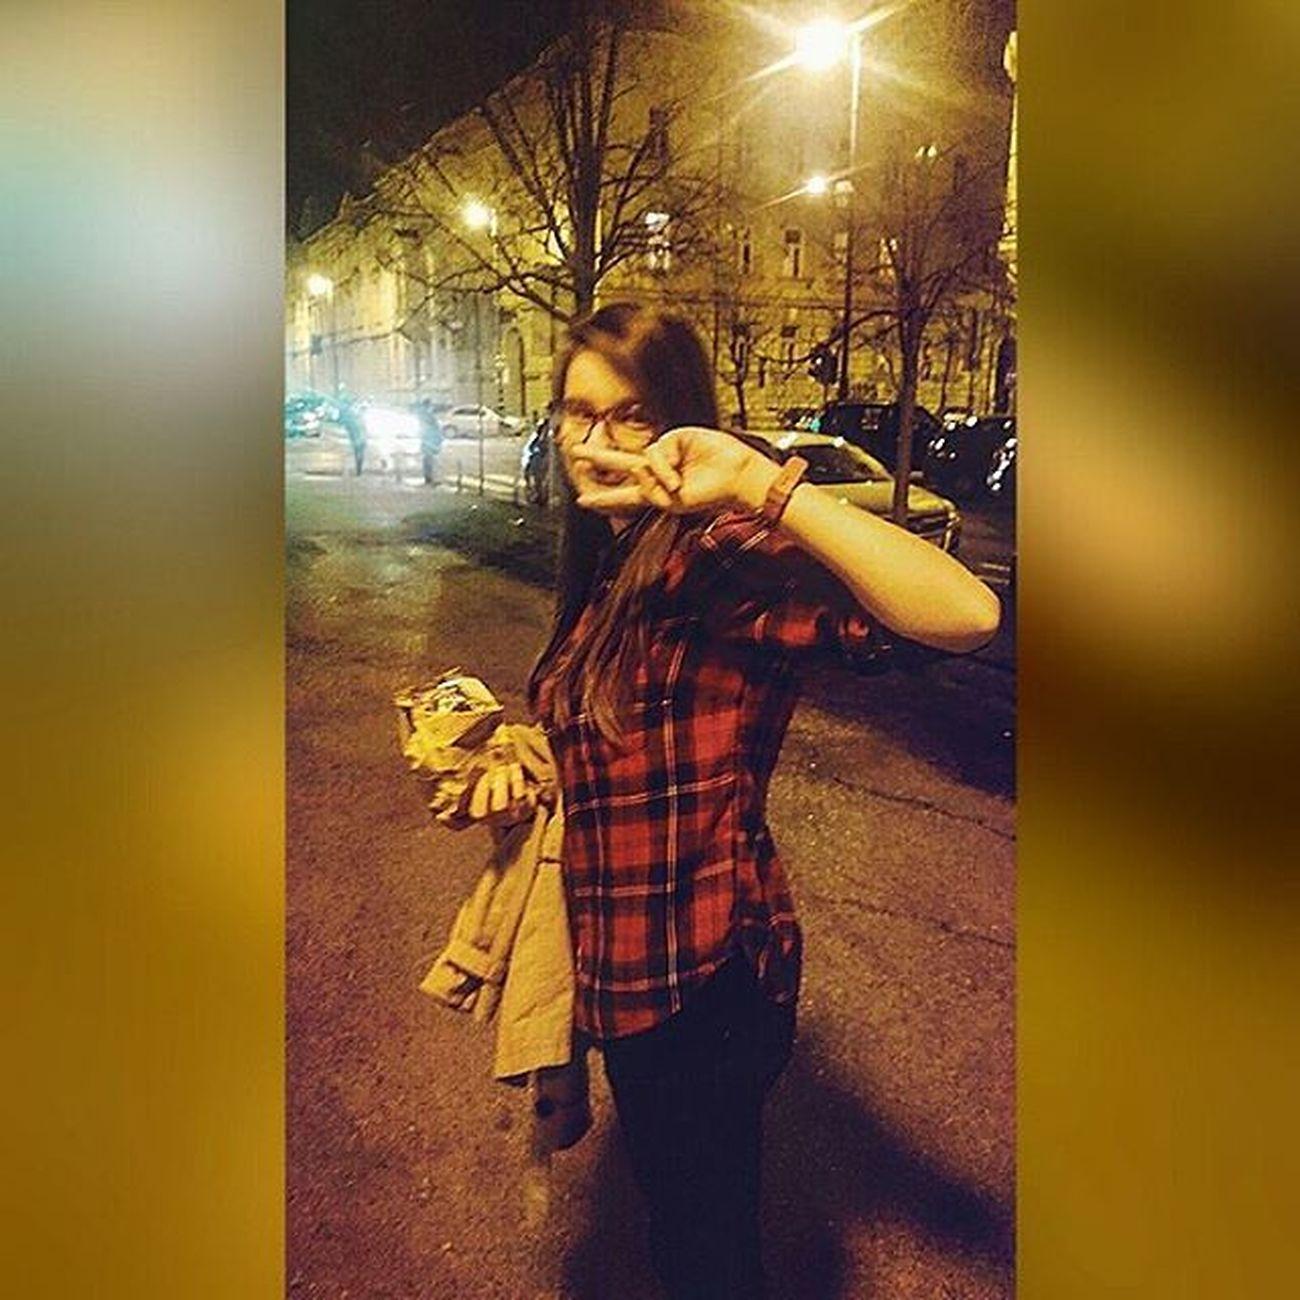 Ono kad neocekujes da ce te slikati i napravis peace tek tolko da prekrijes dio svoje gadne face Logg da me @petar_deveric sliko mislim ko drugi ne 😂 Ugly Girl Croatia Zagreb Dark GettingFat Idot Kuki Idek Damn Lulz Selfie Me Lame